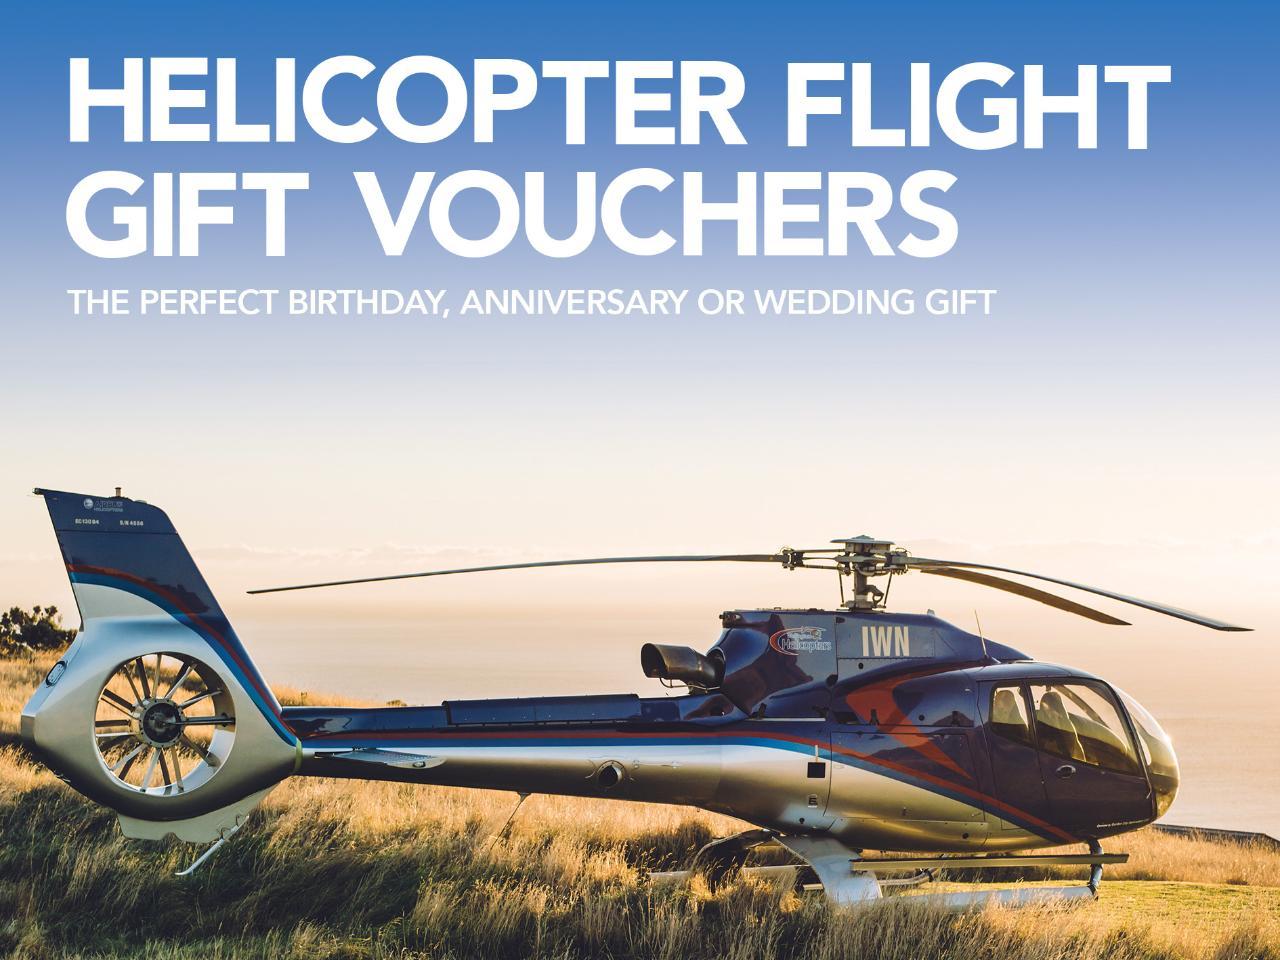 Wellington Helicopters Voucher